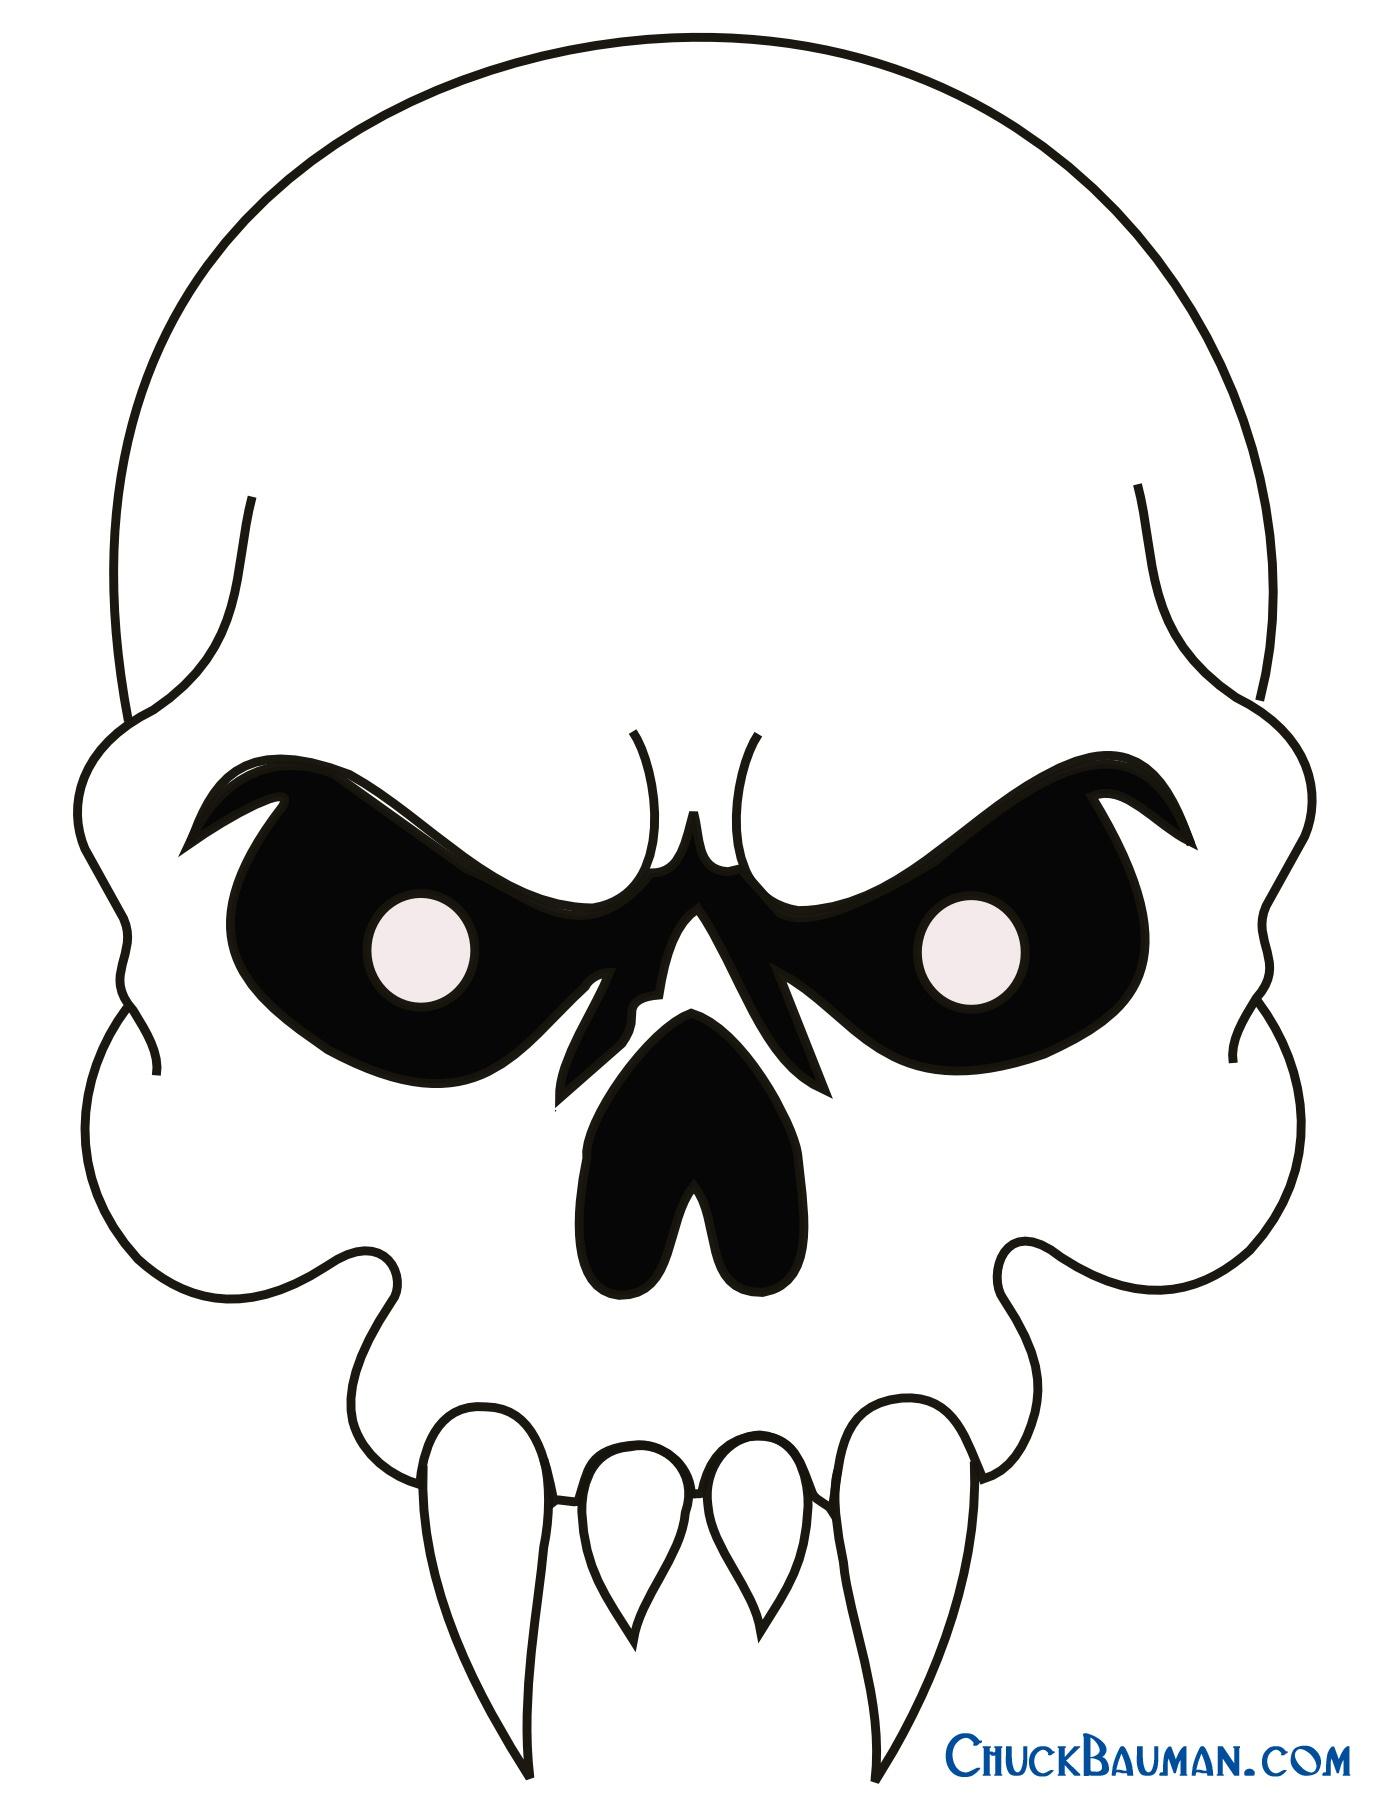 Skulls Airbrushing - Free Skull Airbrushing Stencils - Free - Skull Stencils Free Printable